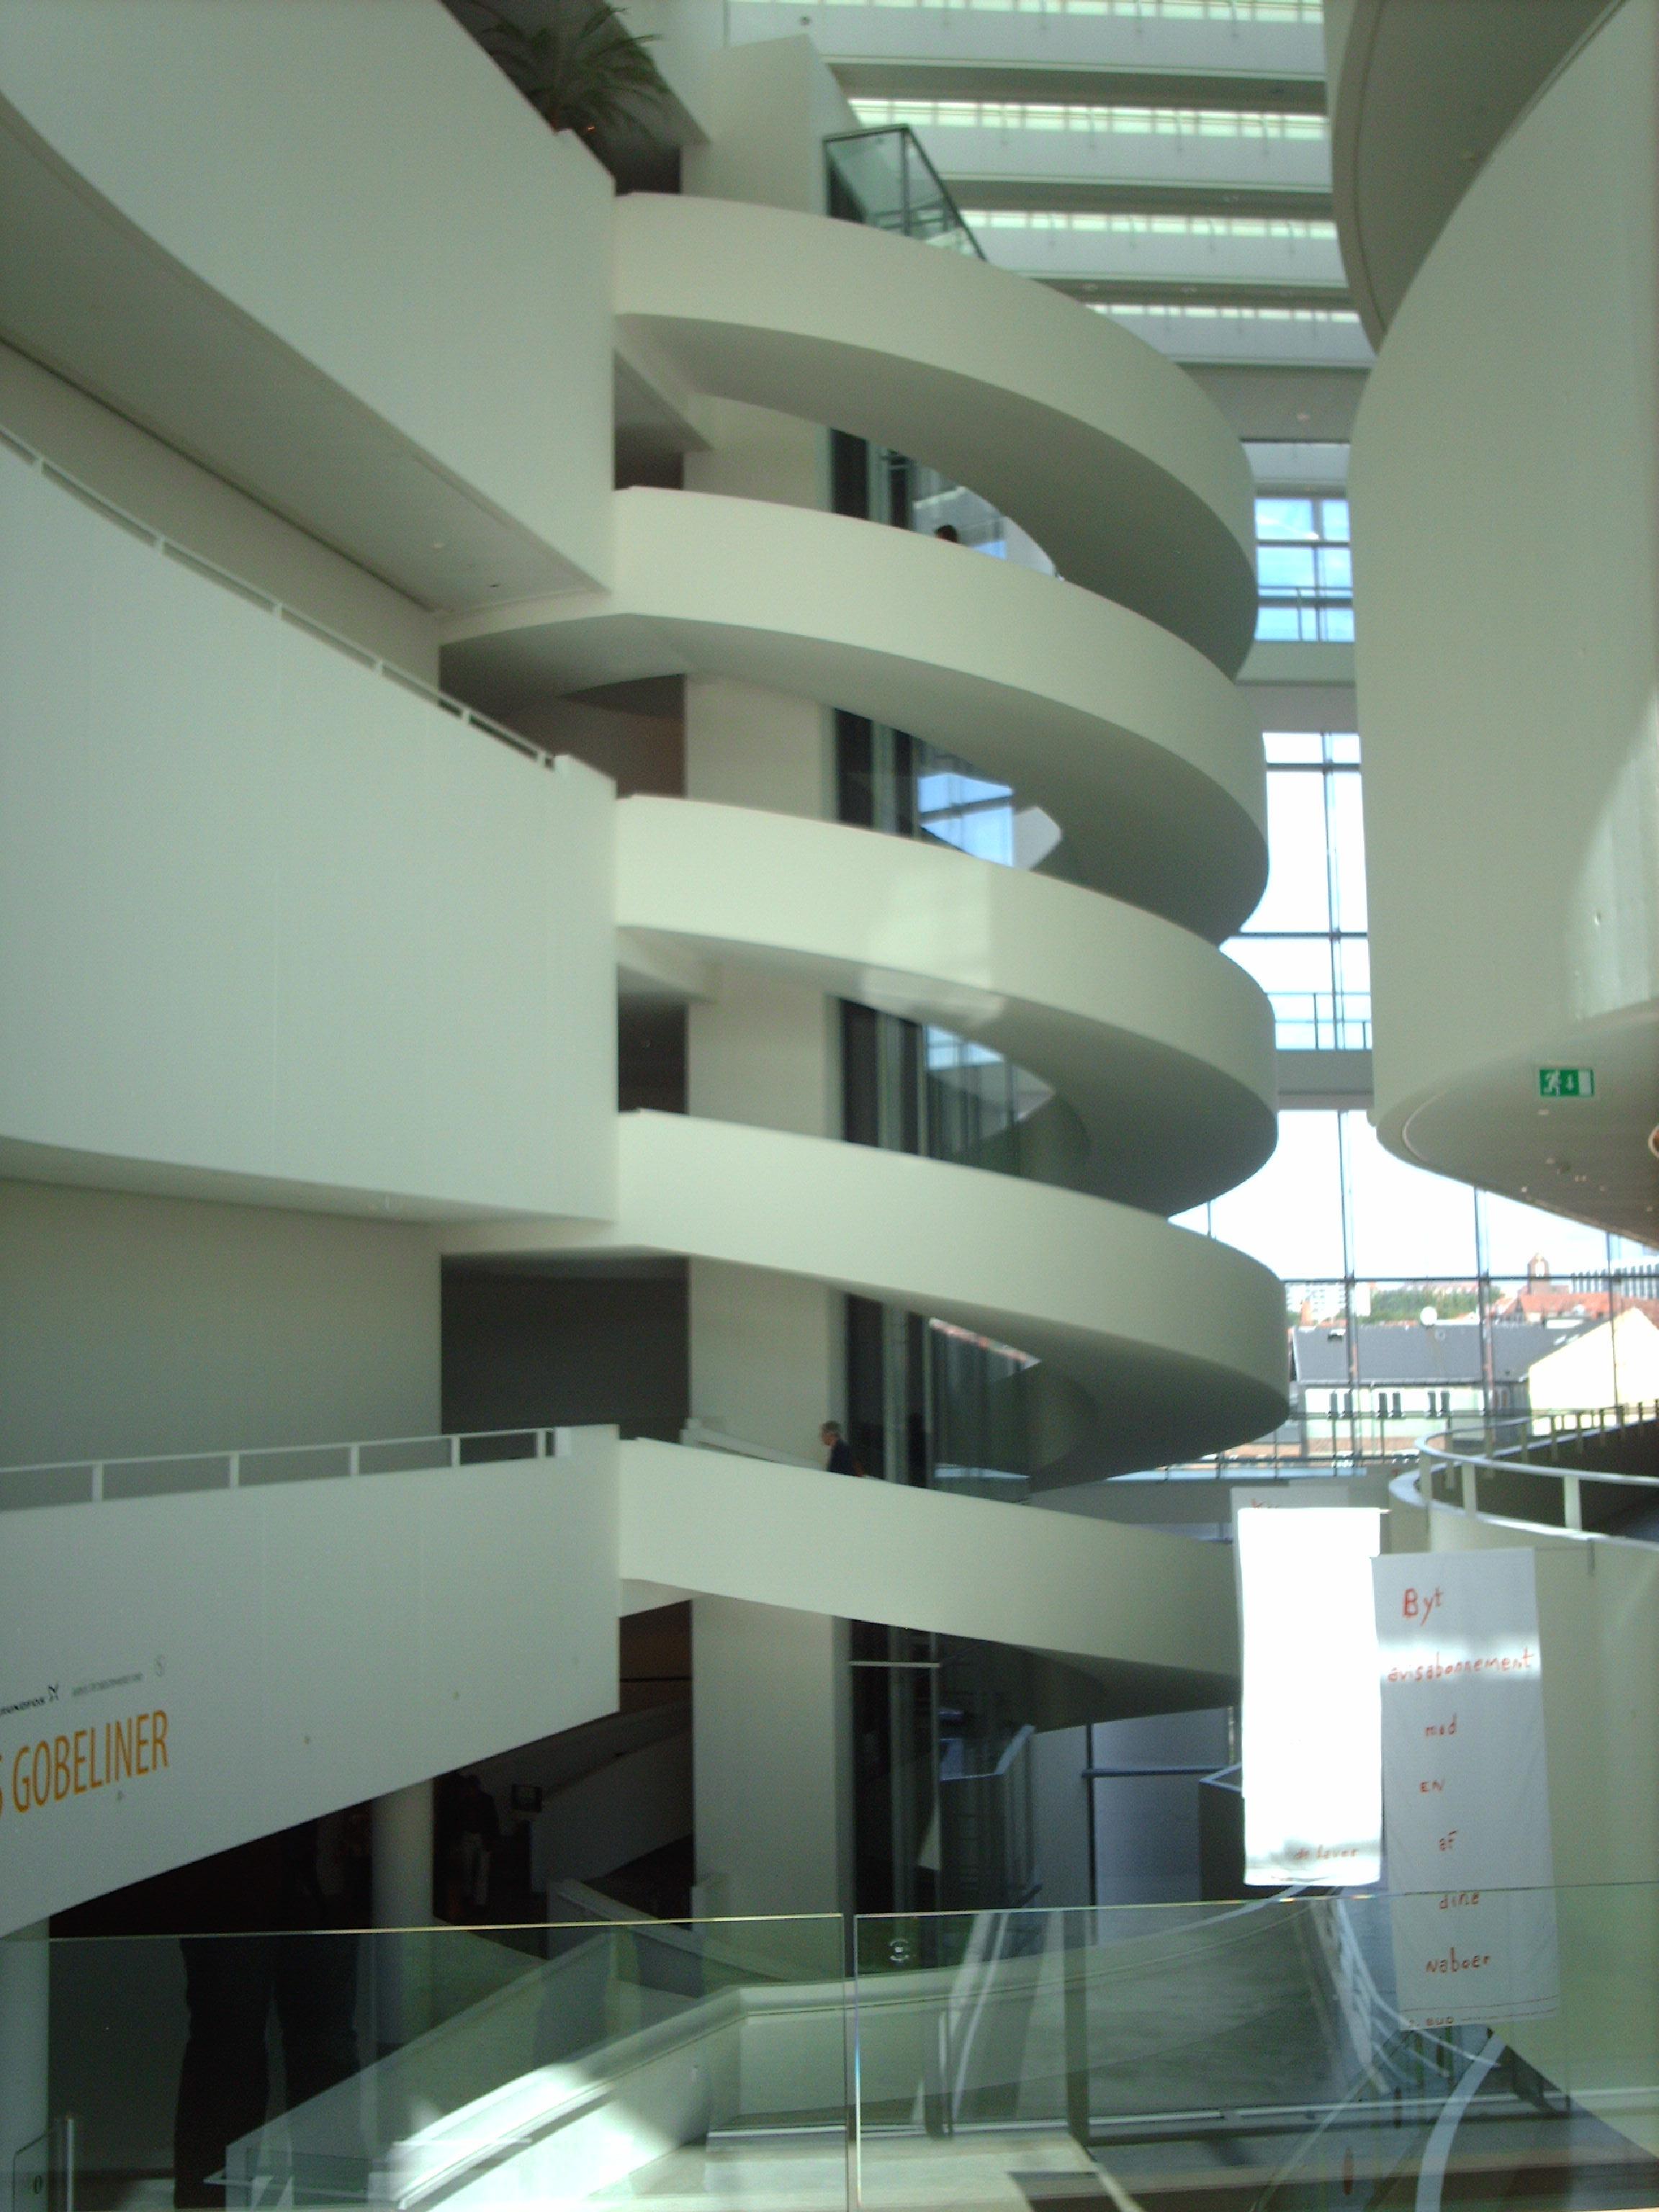 massageklinik aalborg escortpiger i københavn